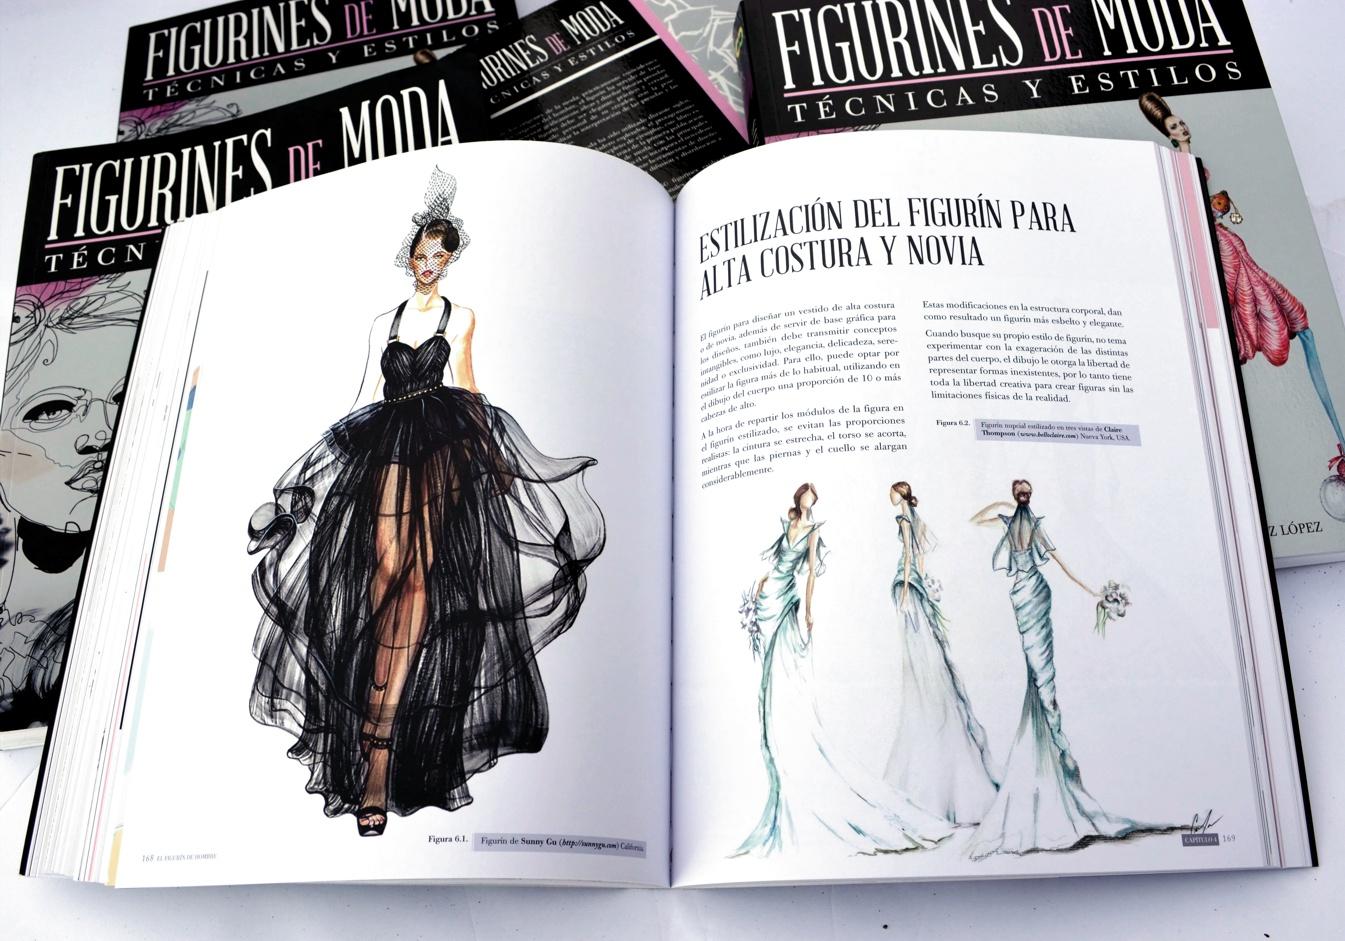 Claire-Thompson-featured-in-book-FIGURINES-DE-MODA-Tecnicas-Estilos.jpg